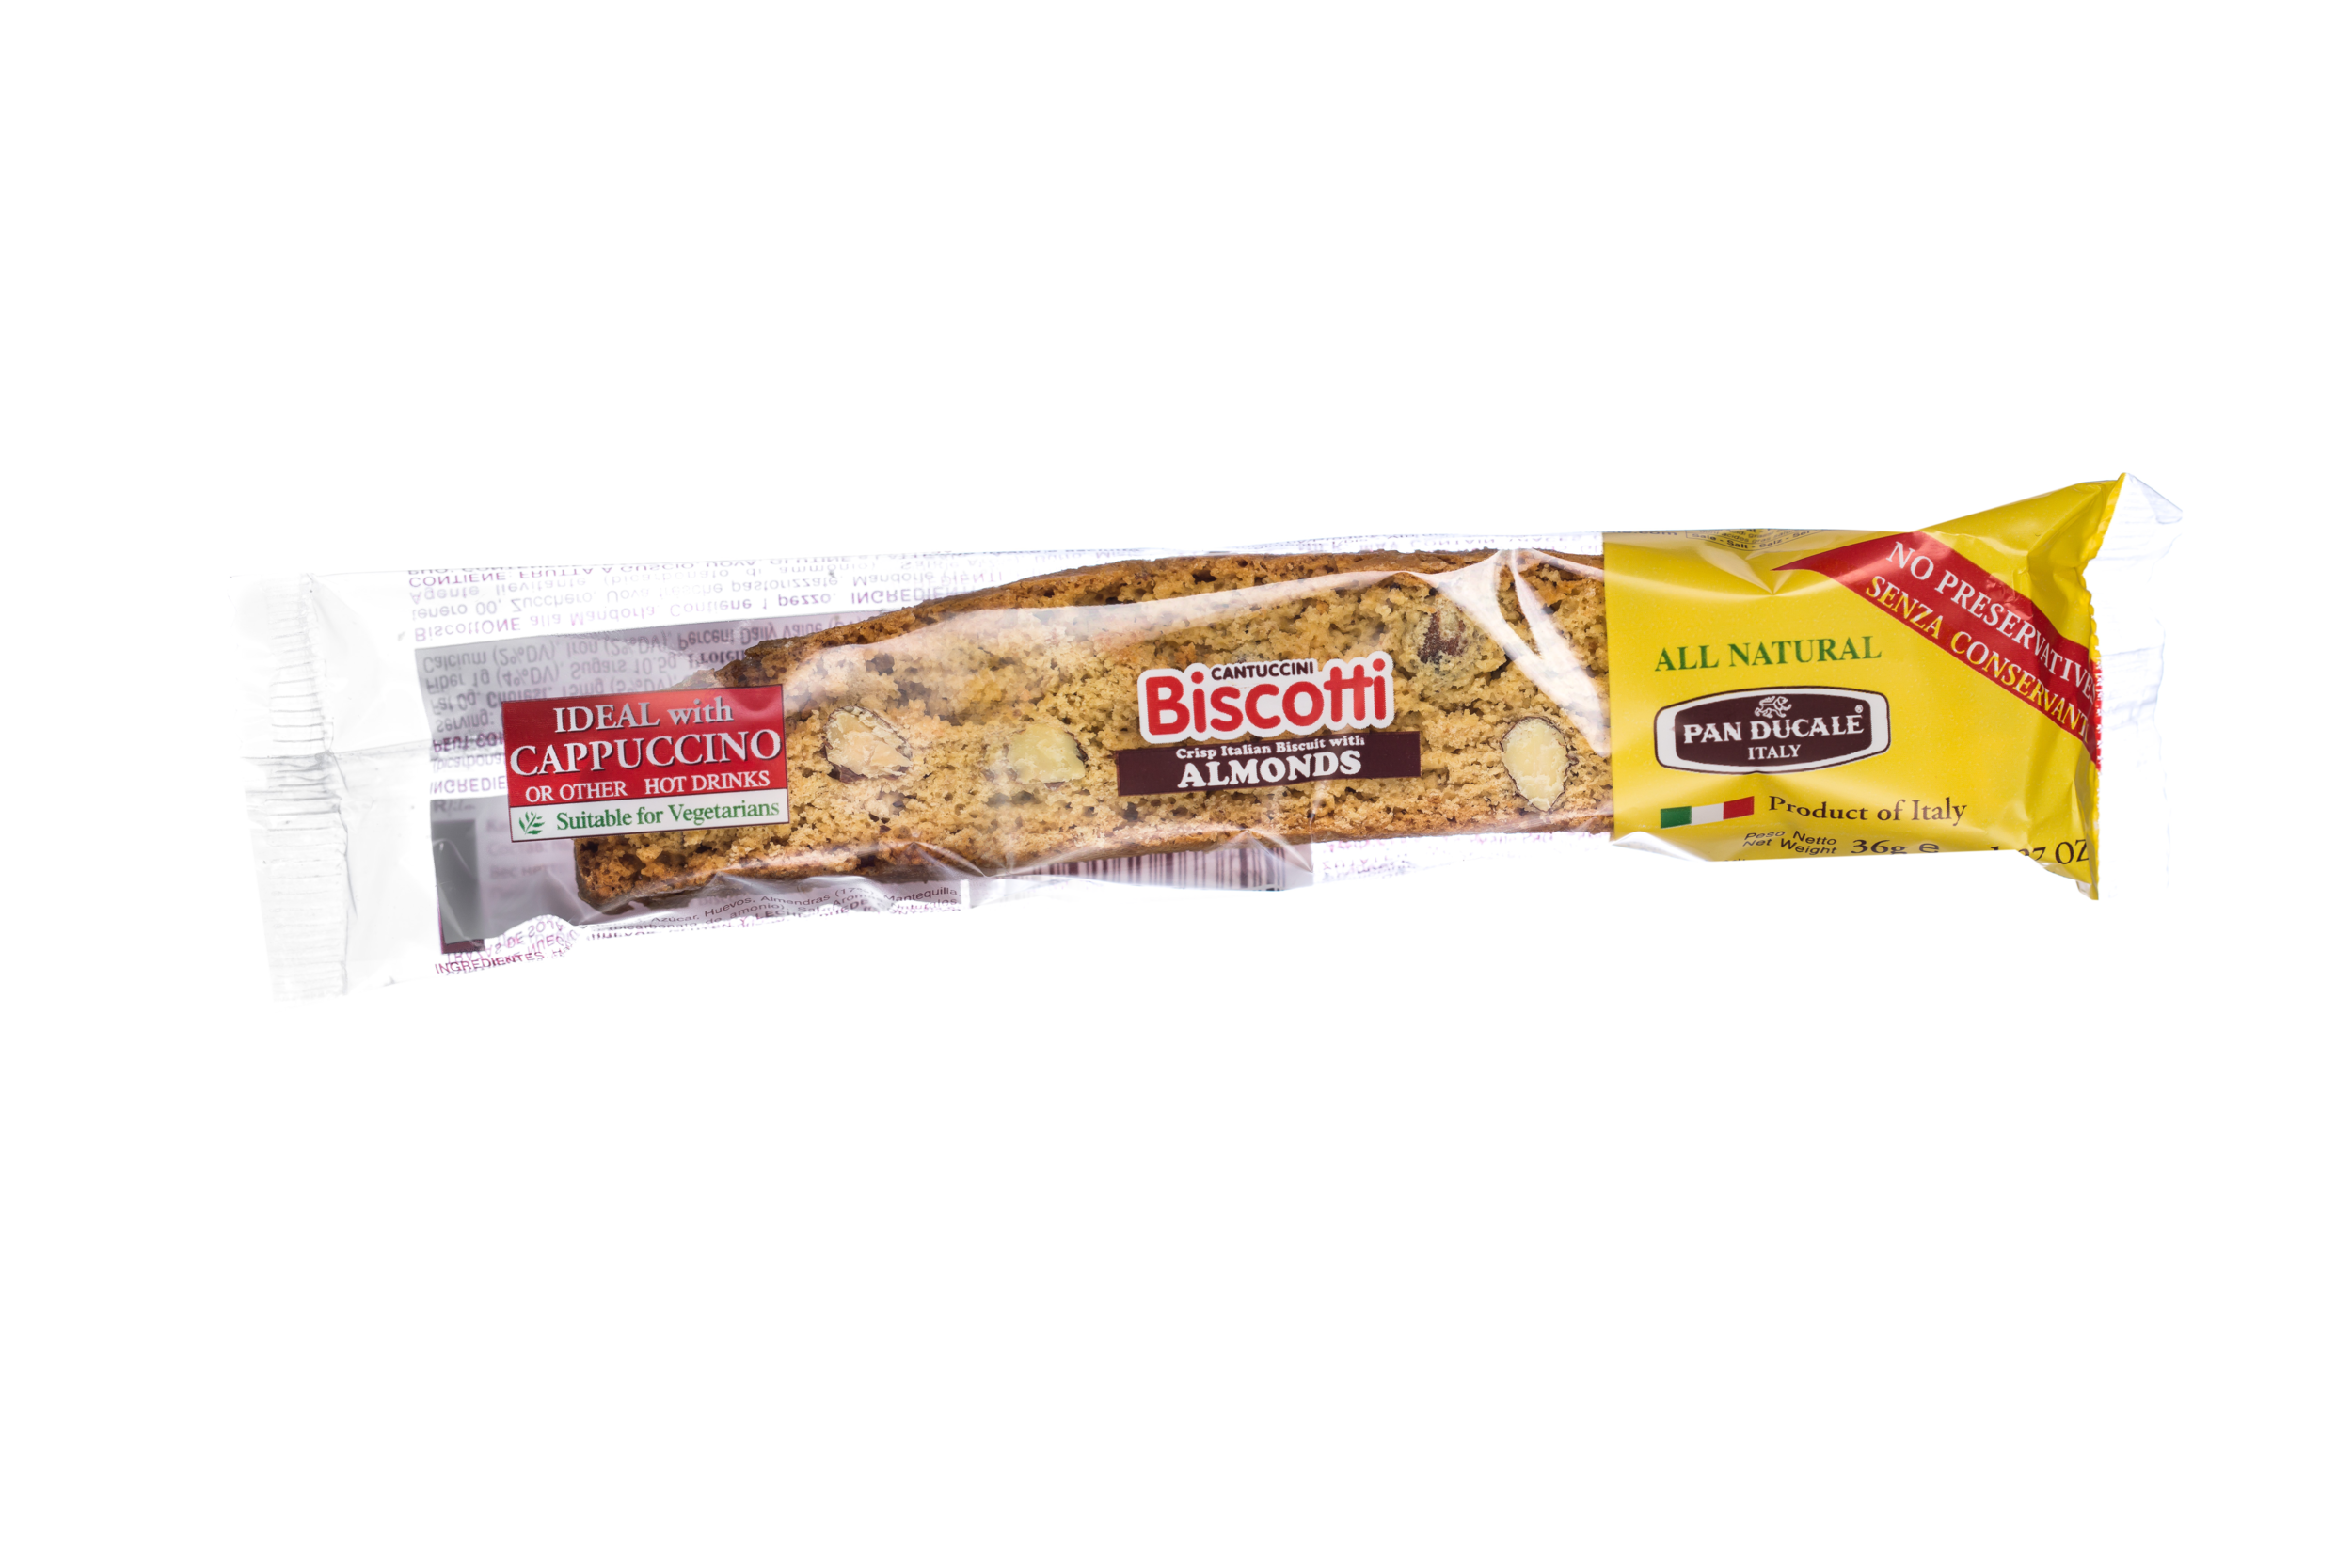 Biscotti Almond